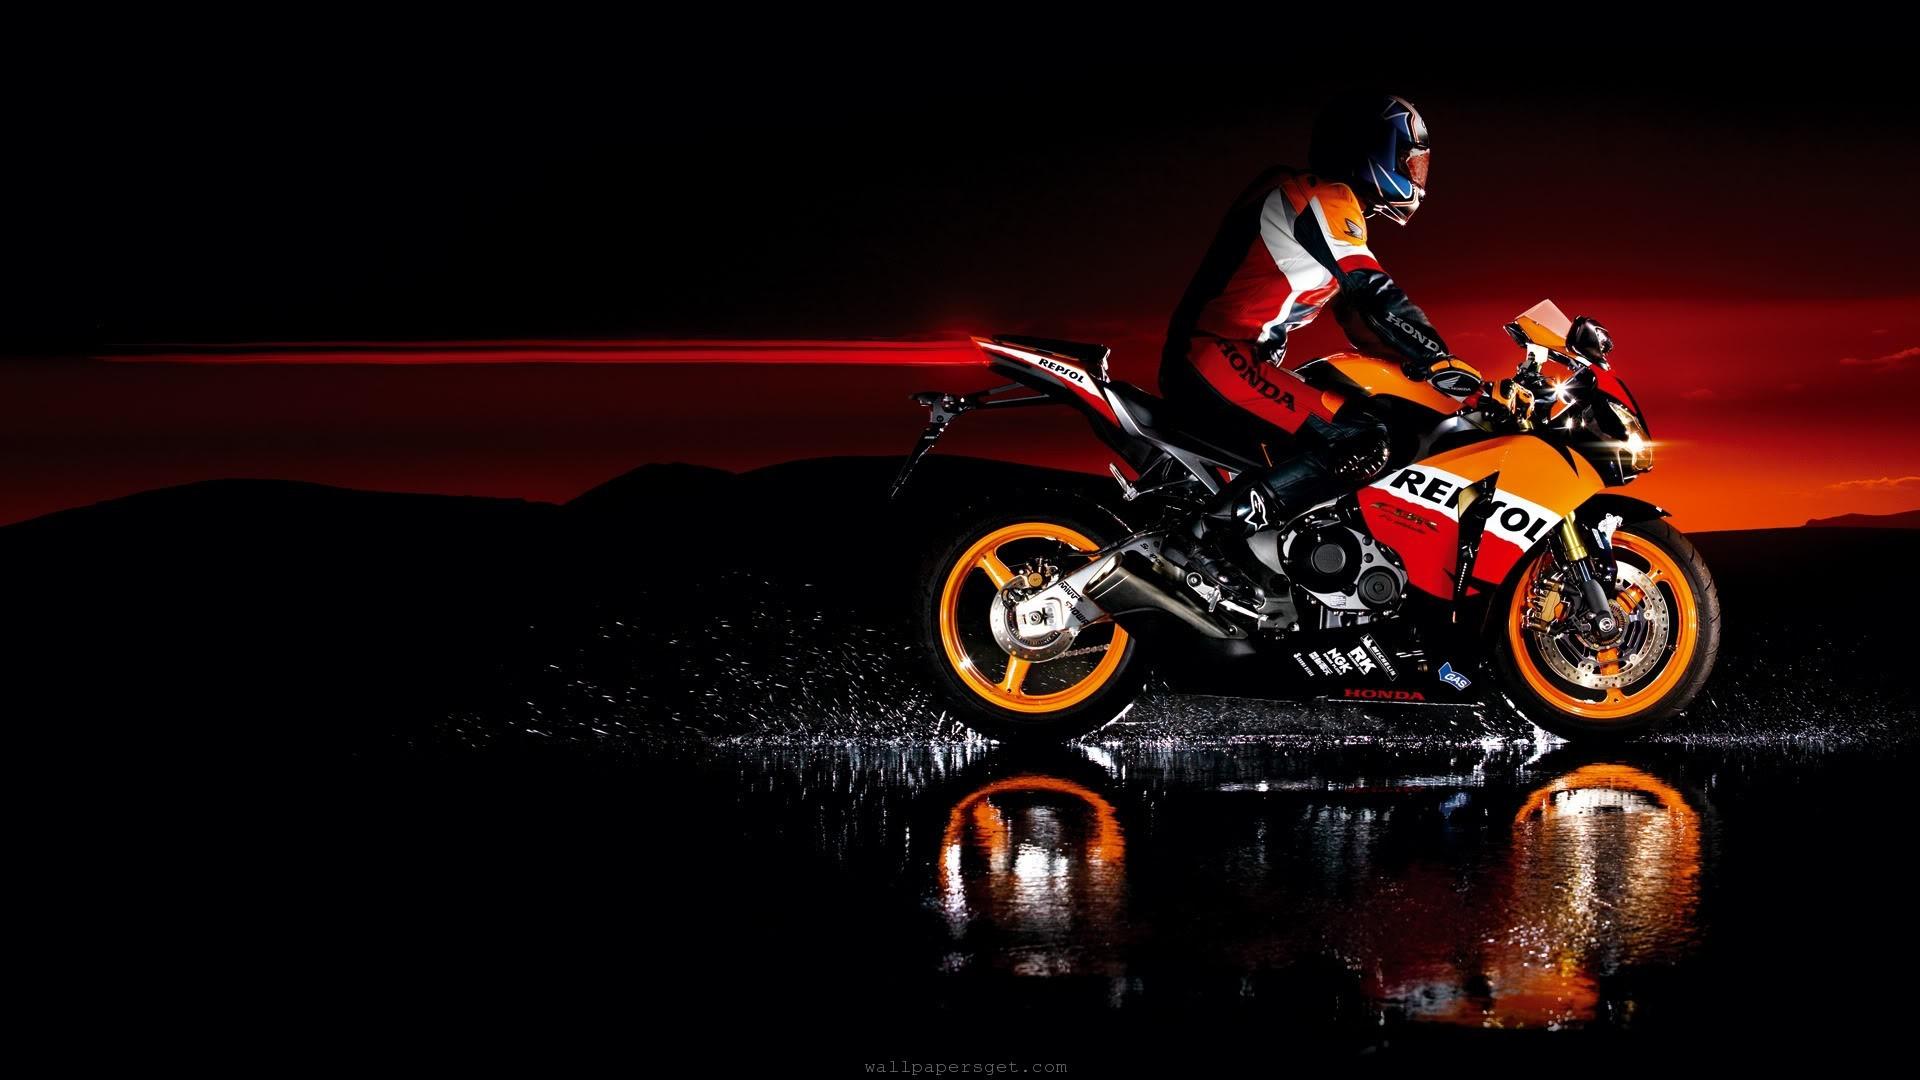 Honda motorcycle wallpapers 6763 hd wallpapers in bikes imagesci com